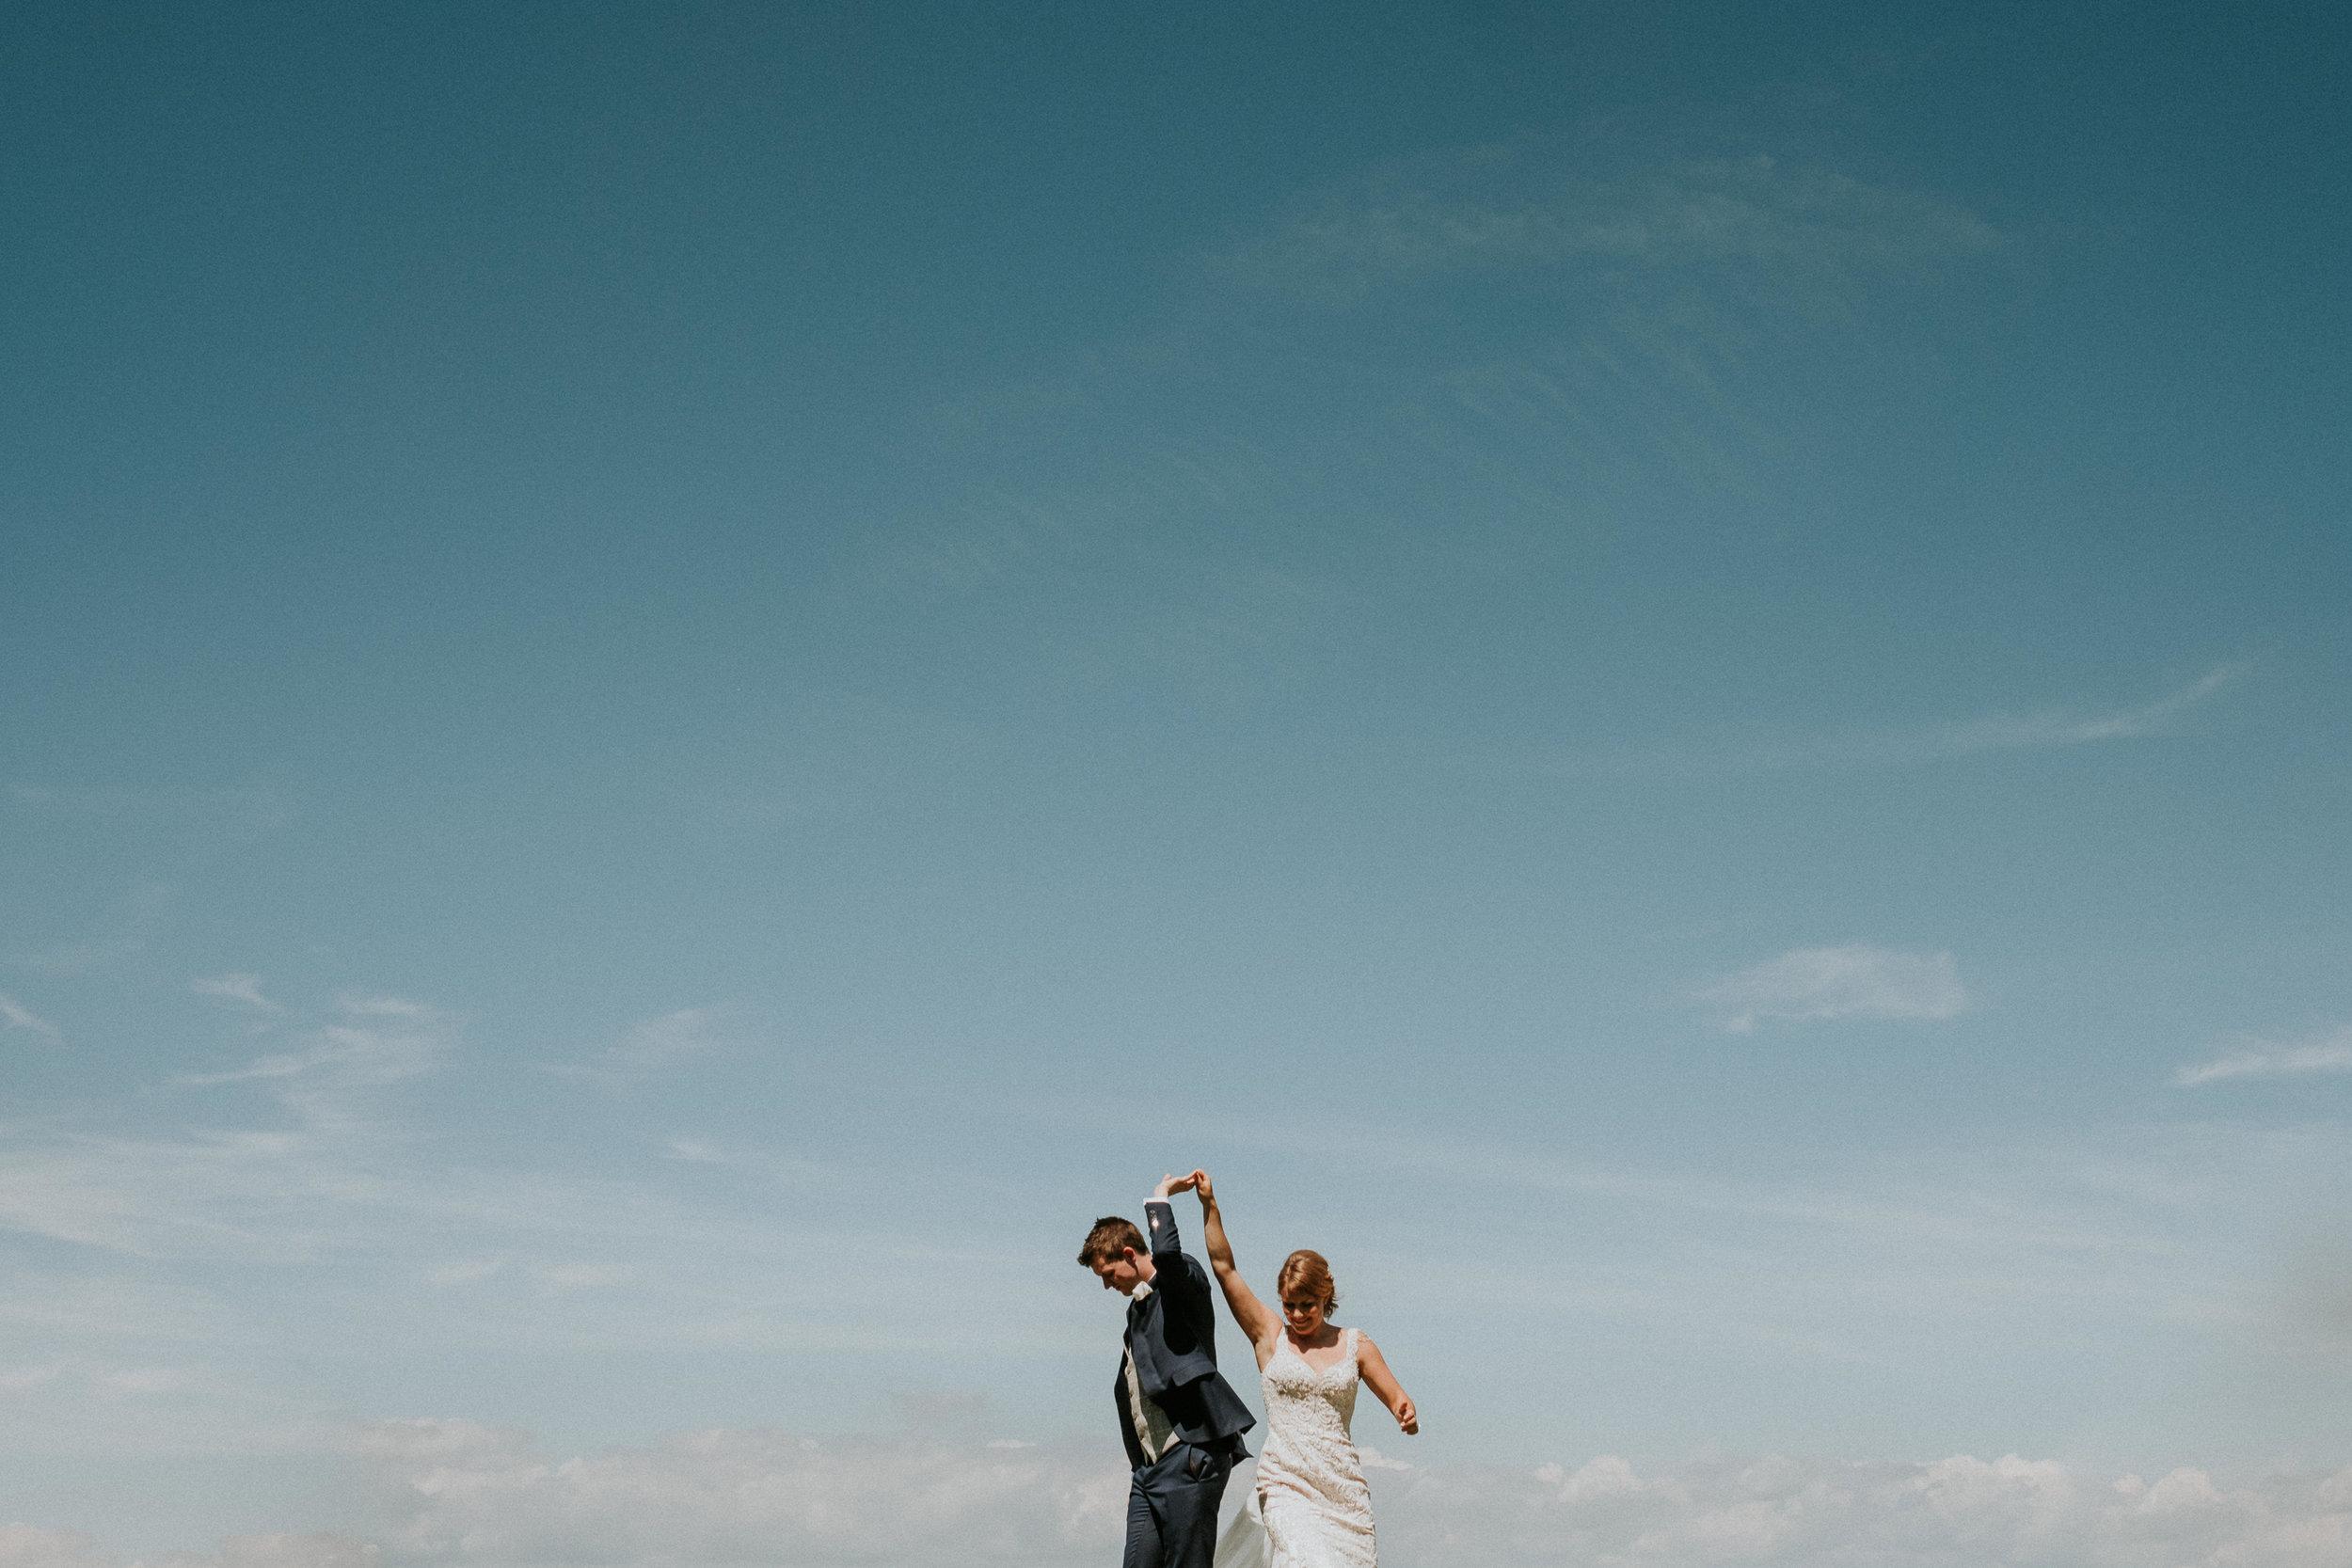 5 Southend Barns wedding photography Sussex creative fun joanna nicole photography1.jpg